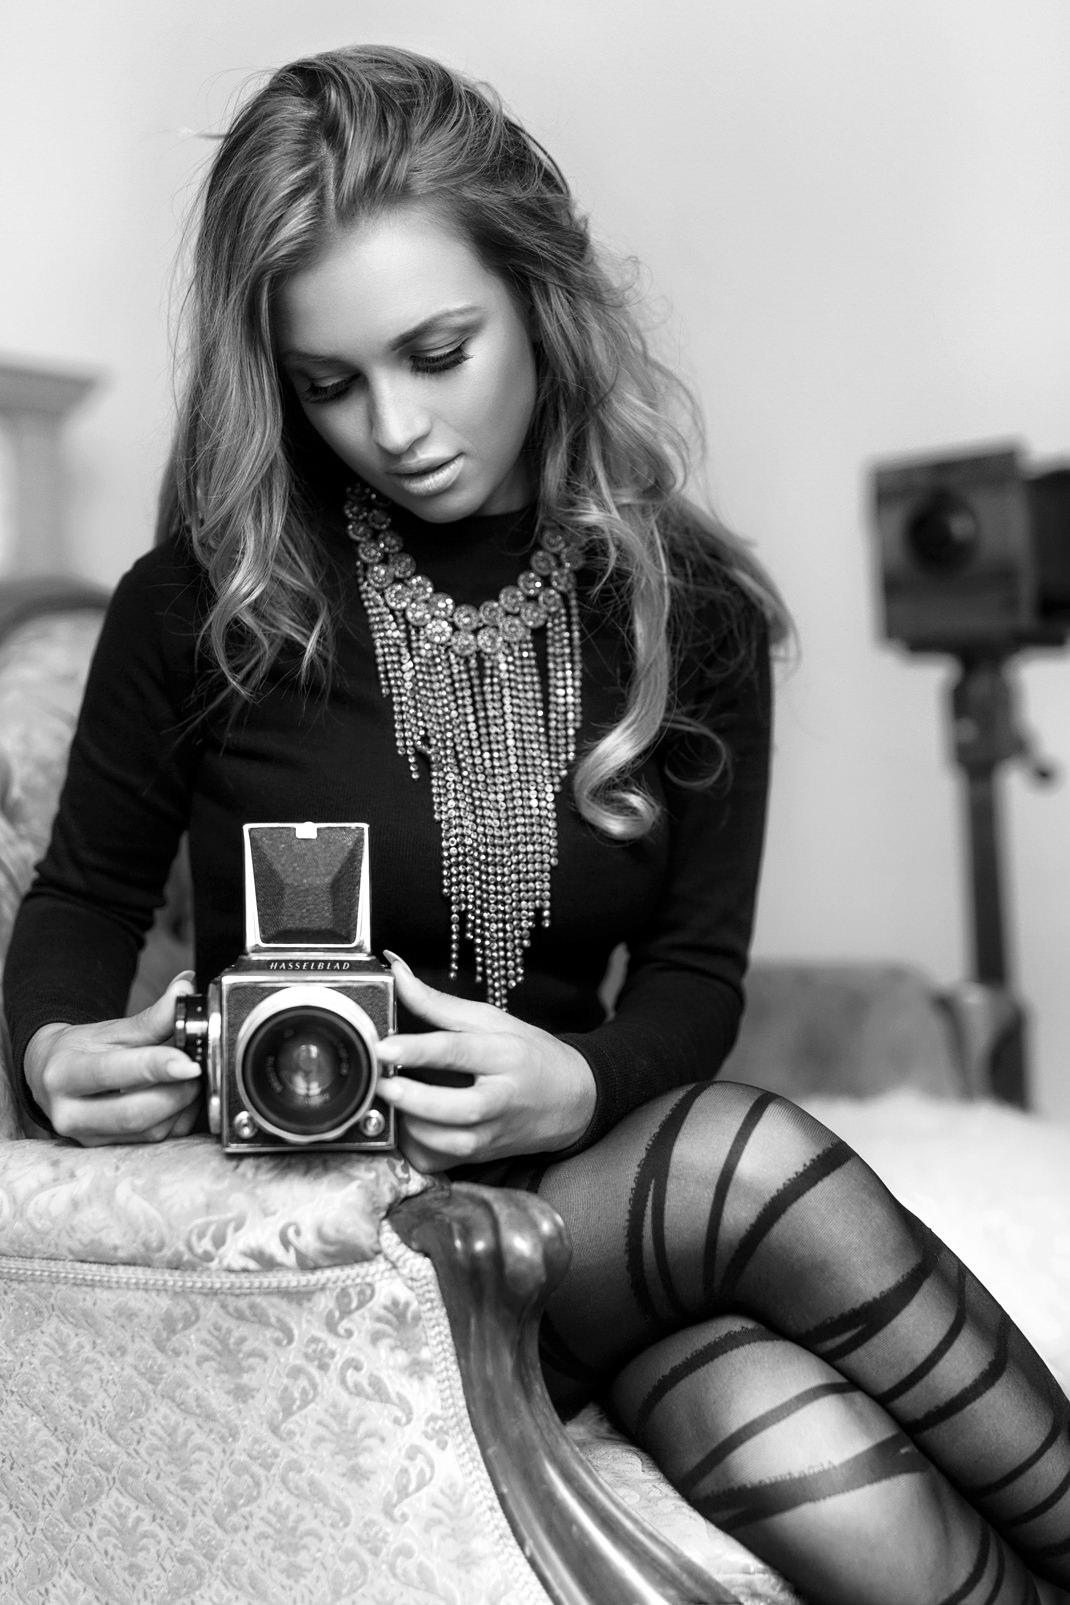 Two Beauties - Rike & Hasselblad 500c - Markus Hertzsch - Camera - Girl